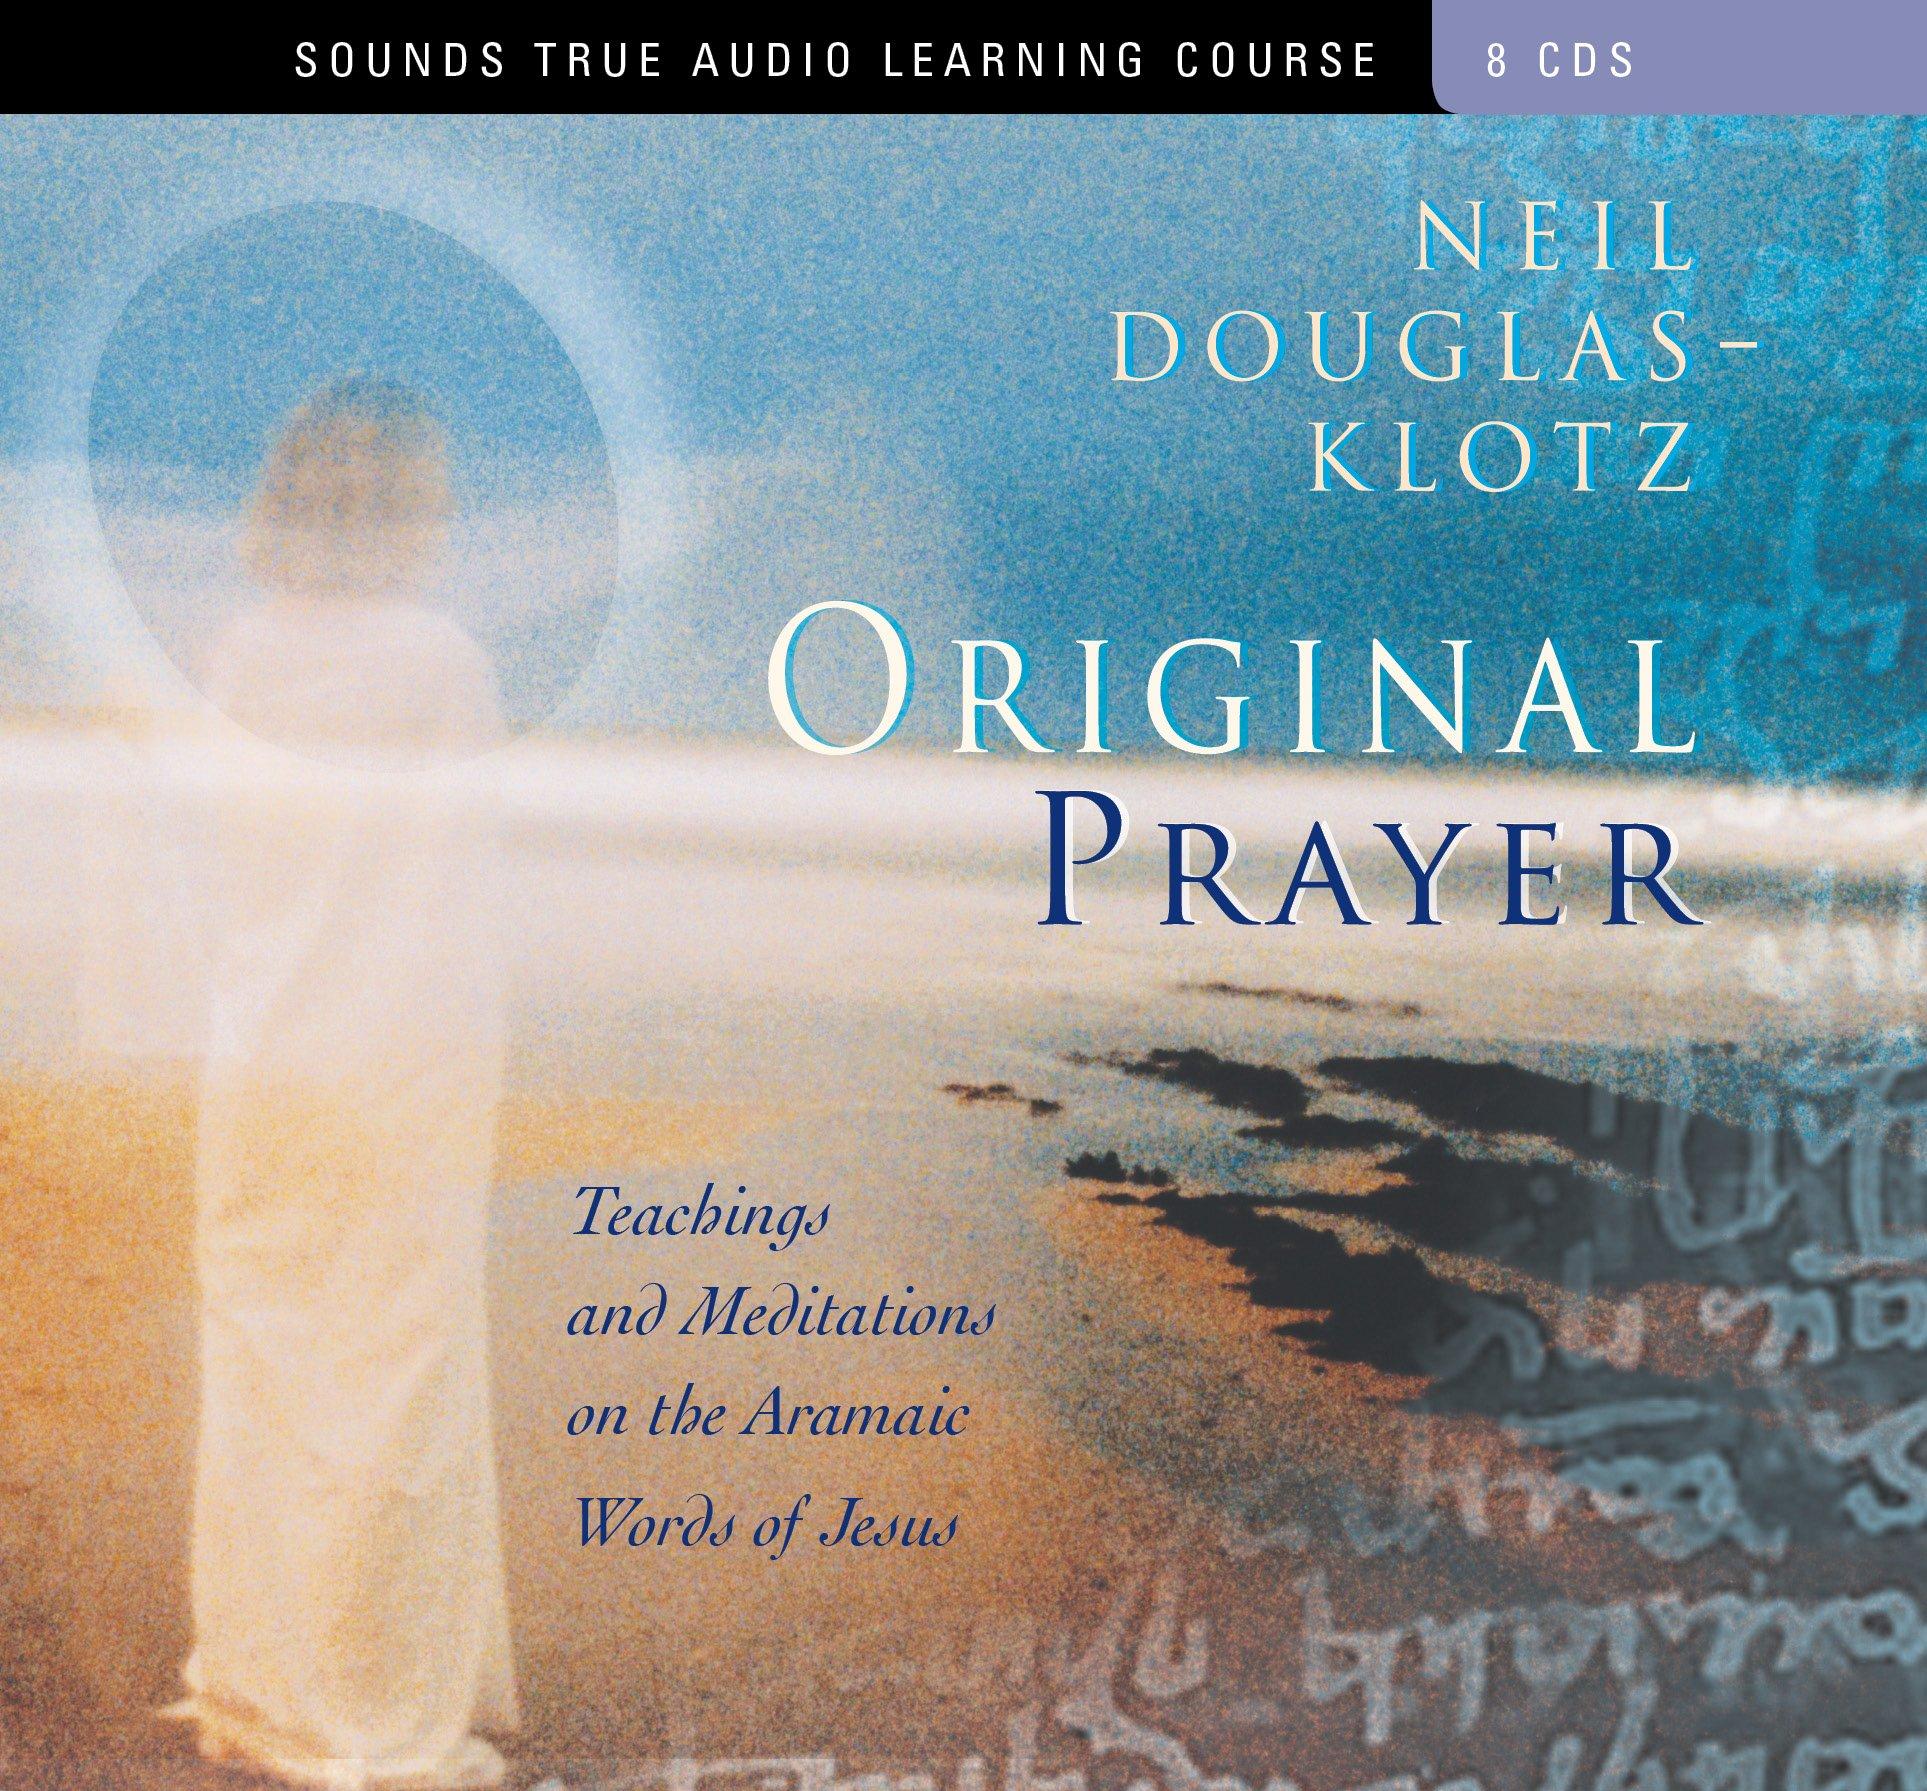 Original Prayer: Teachings and Meditations on the Aramaic Words of Jesus